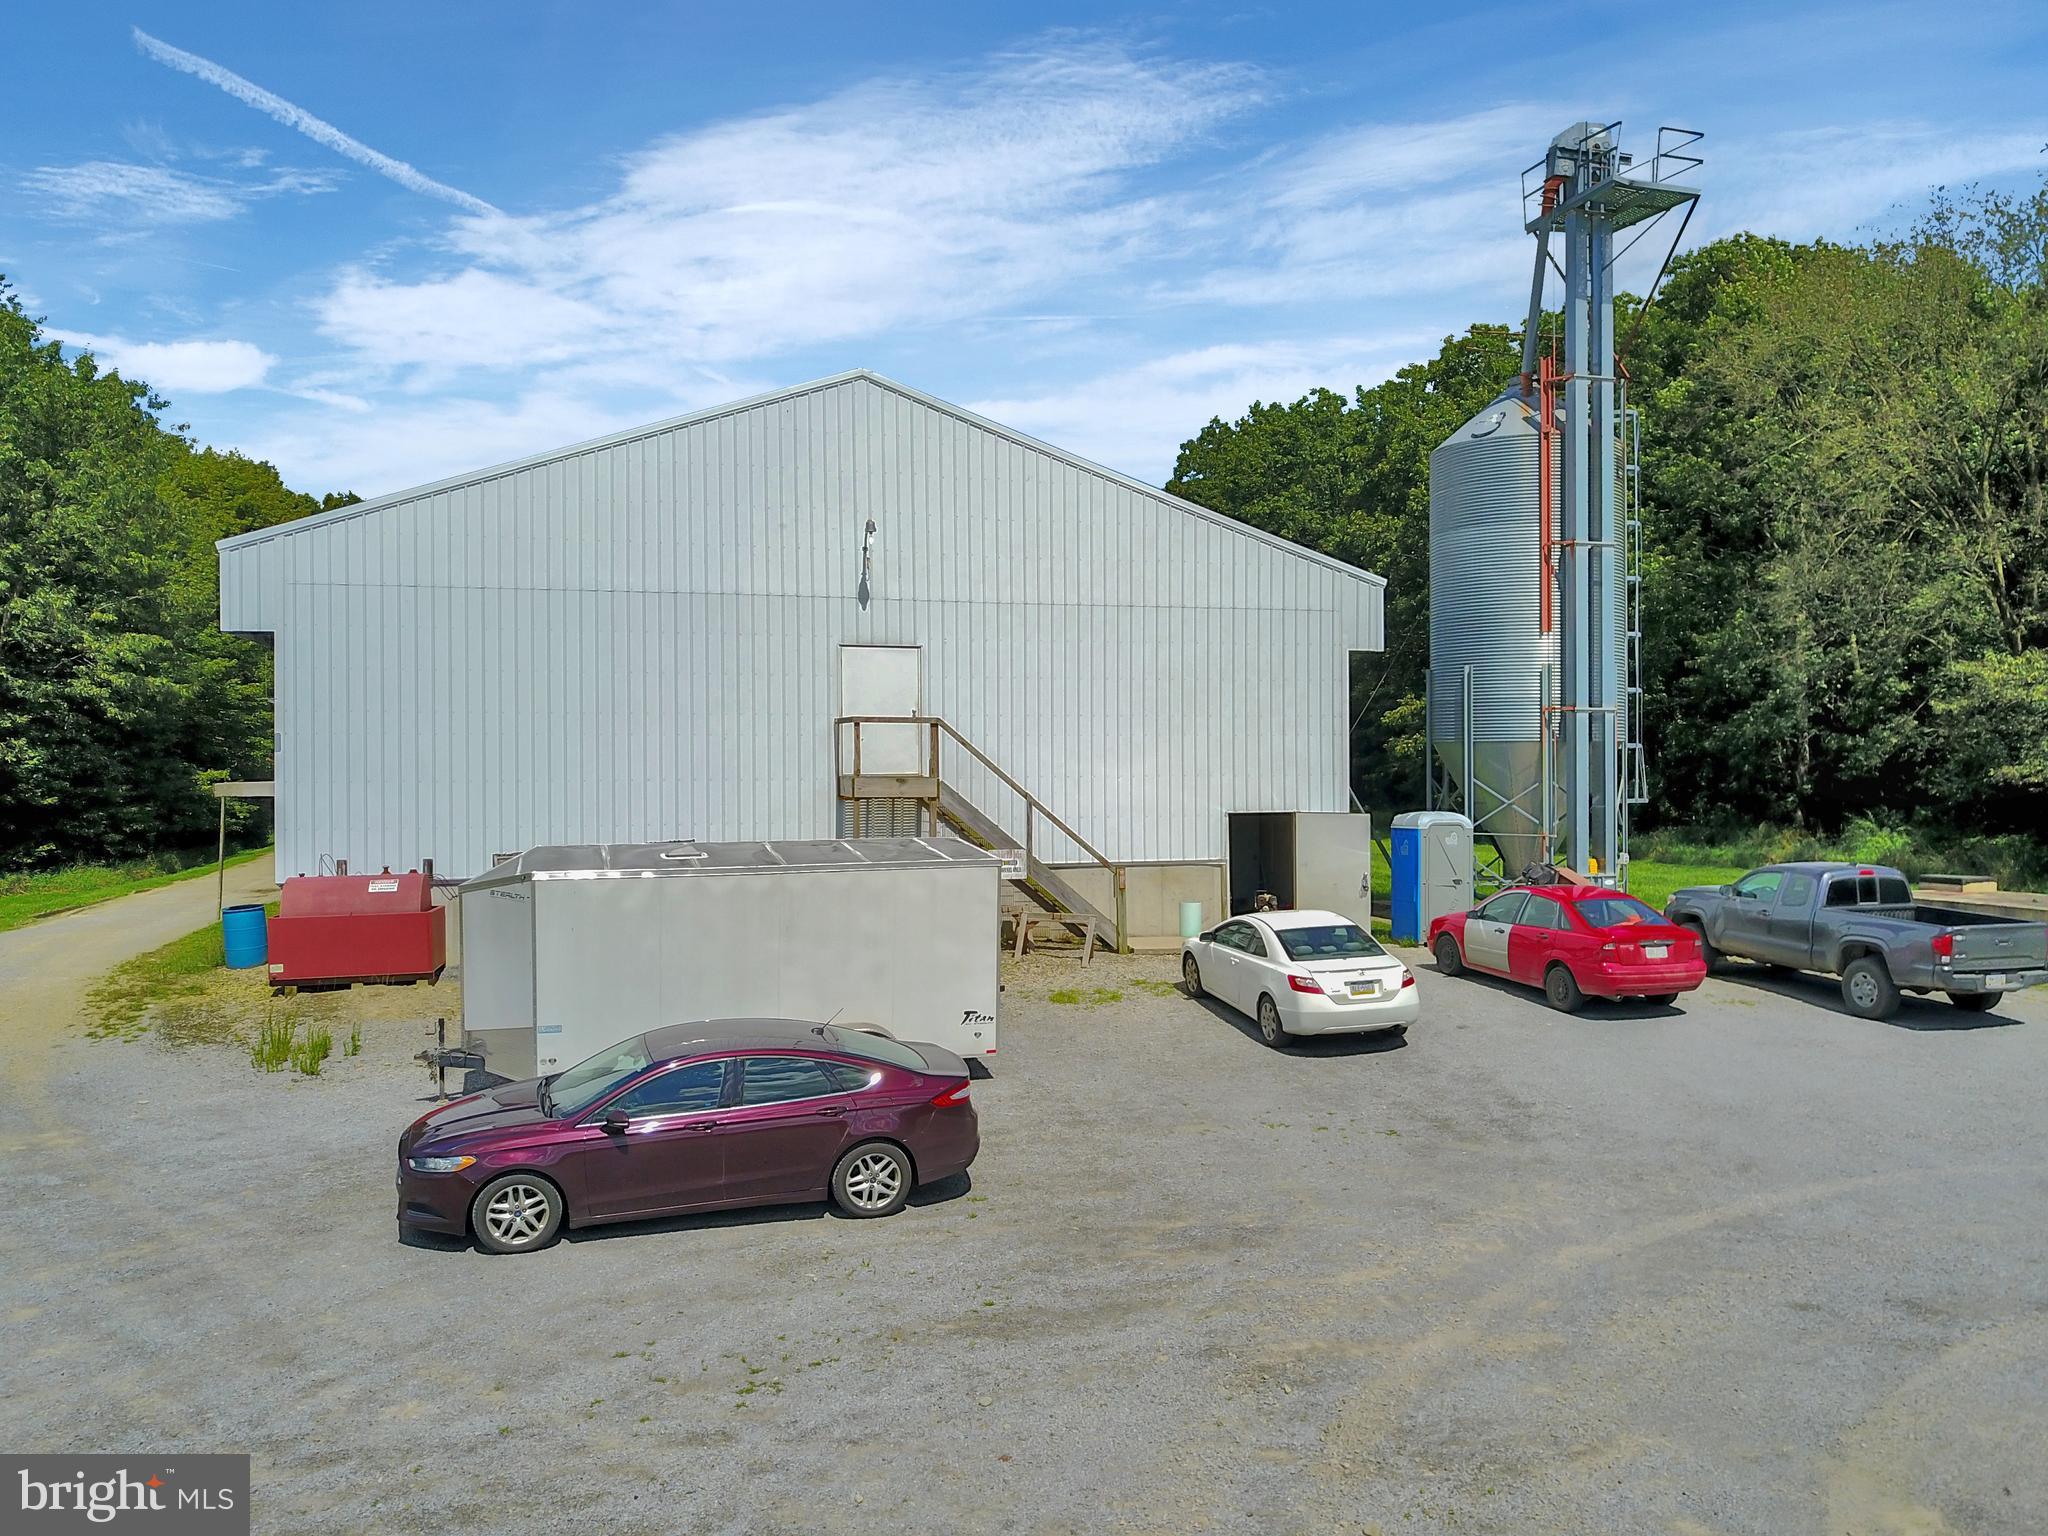 11549 Sperry Rd, Atlantic, PA 16111